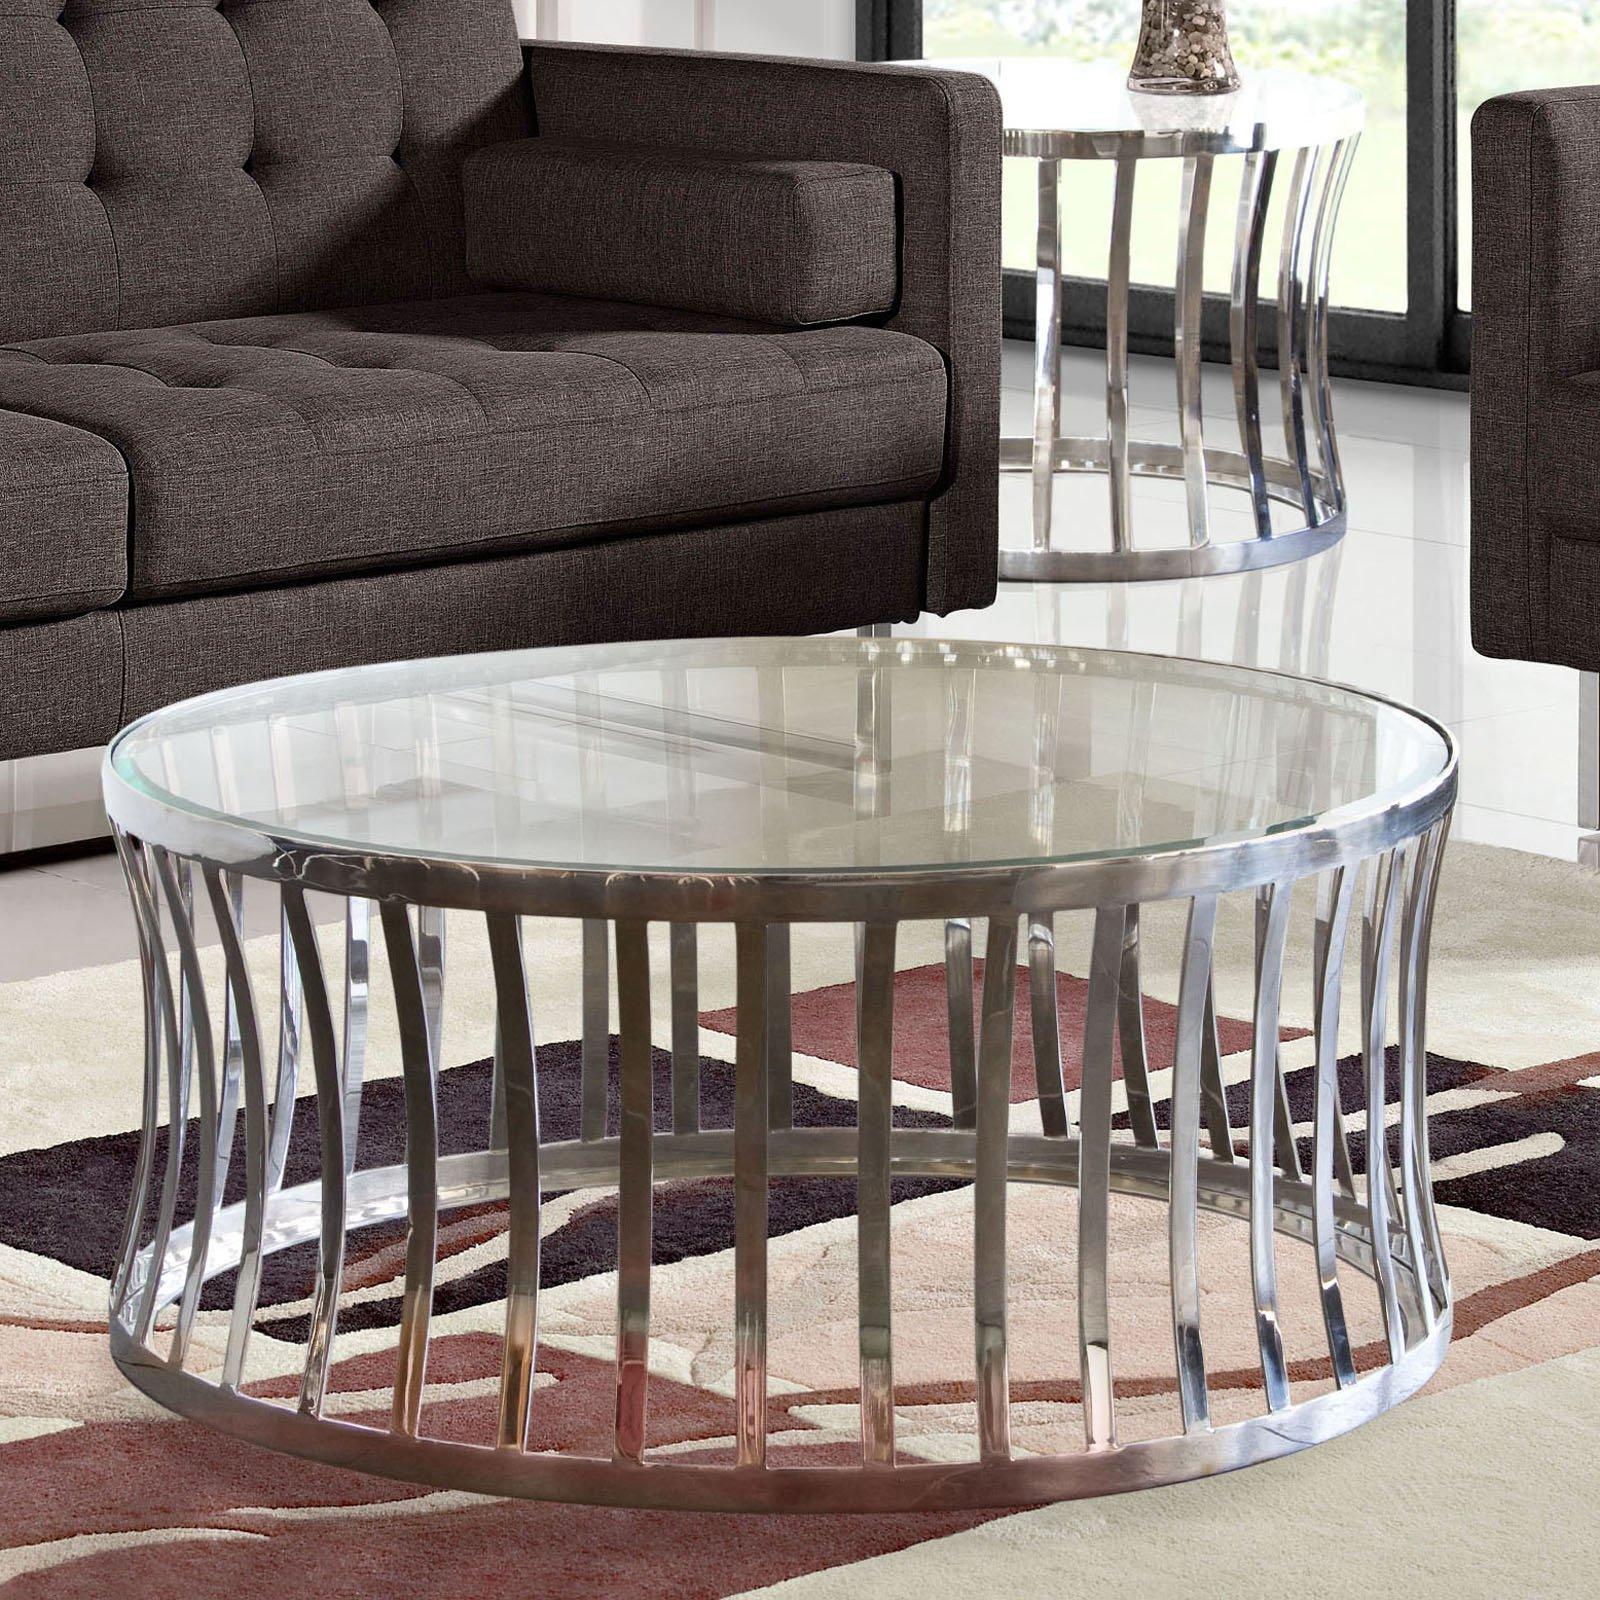 Diamond Sofa Capri Round Glass Top Cocktail Table by Diamond Sofa